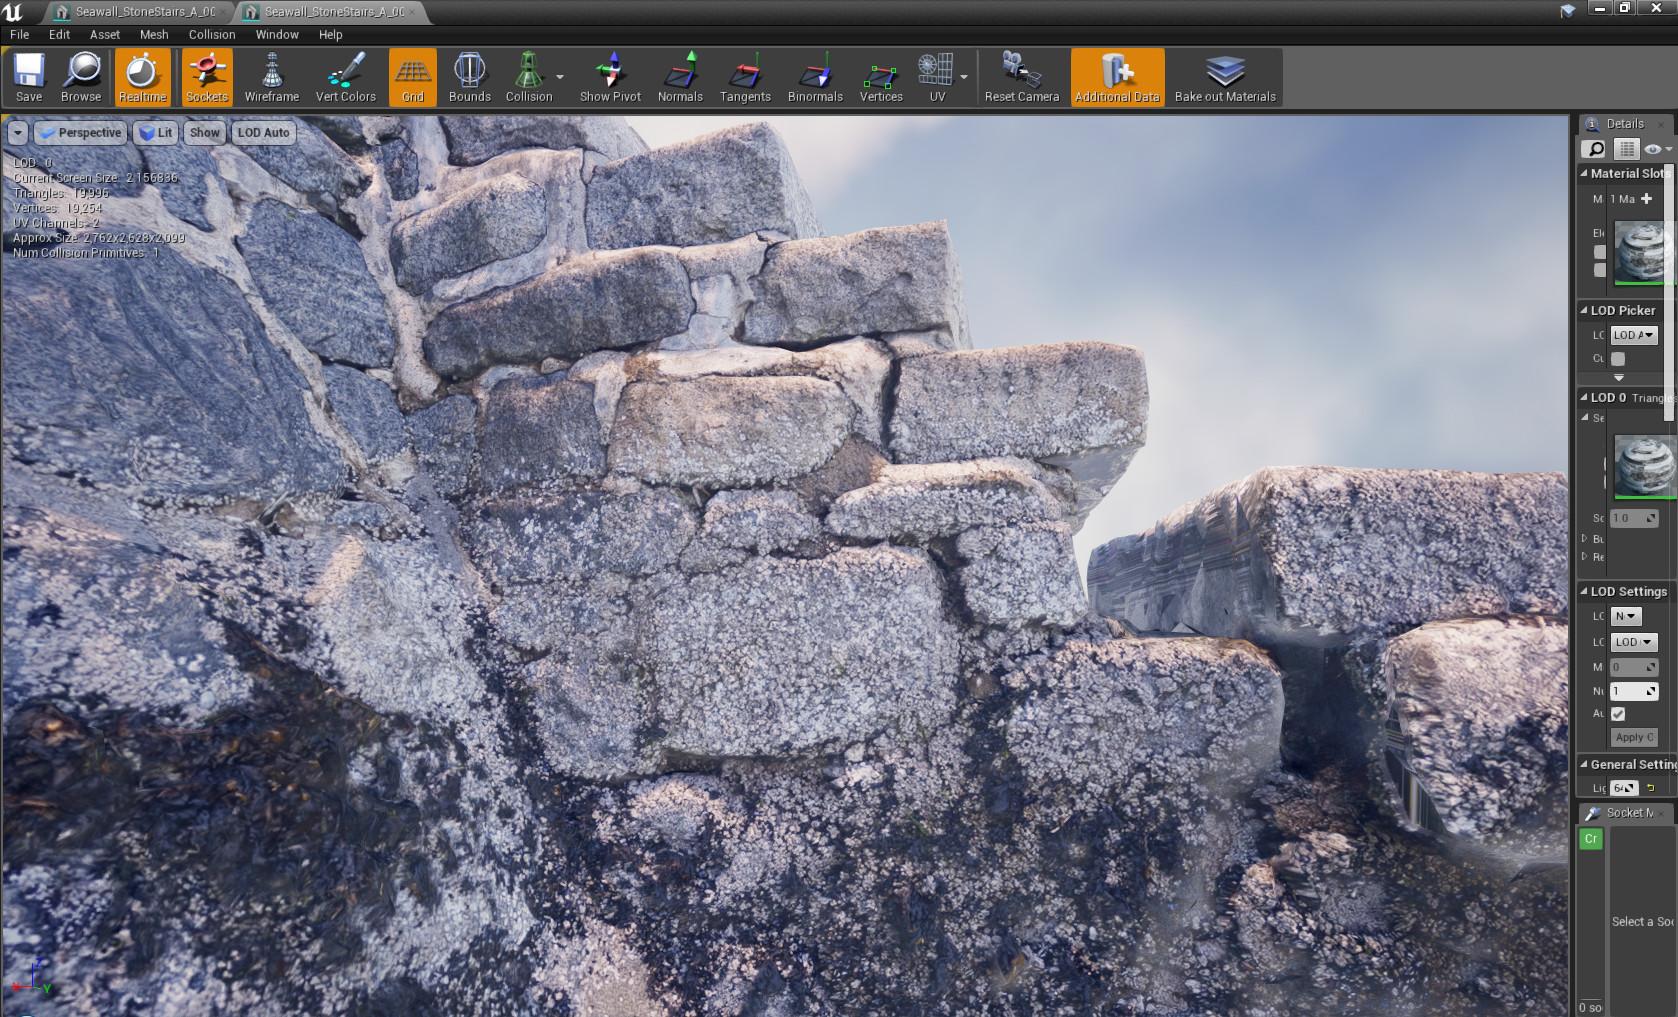 ArtStation - Photogrammetry Samples + Unreal Engine, Kevin Rawlinson